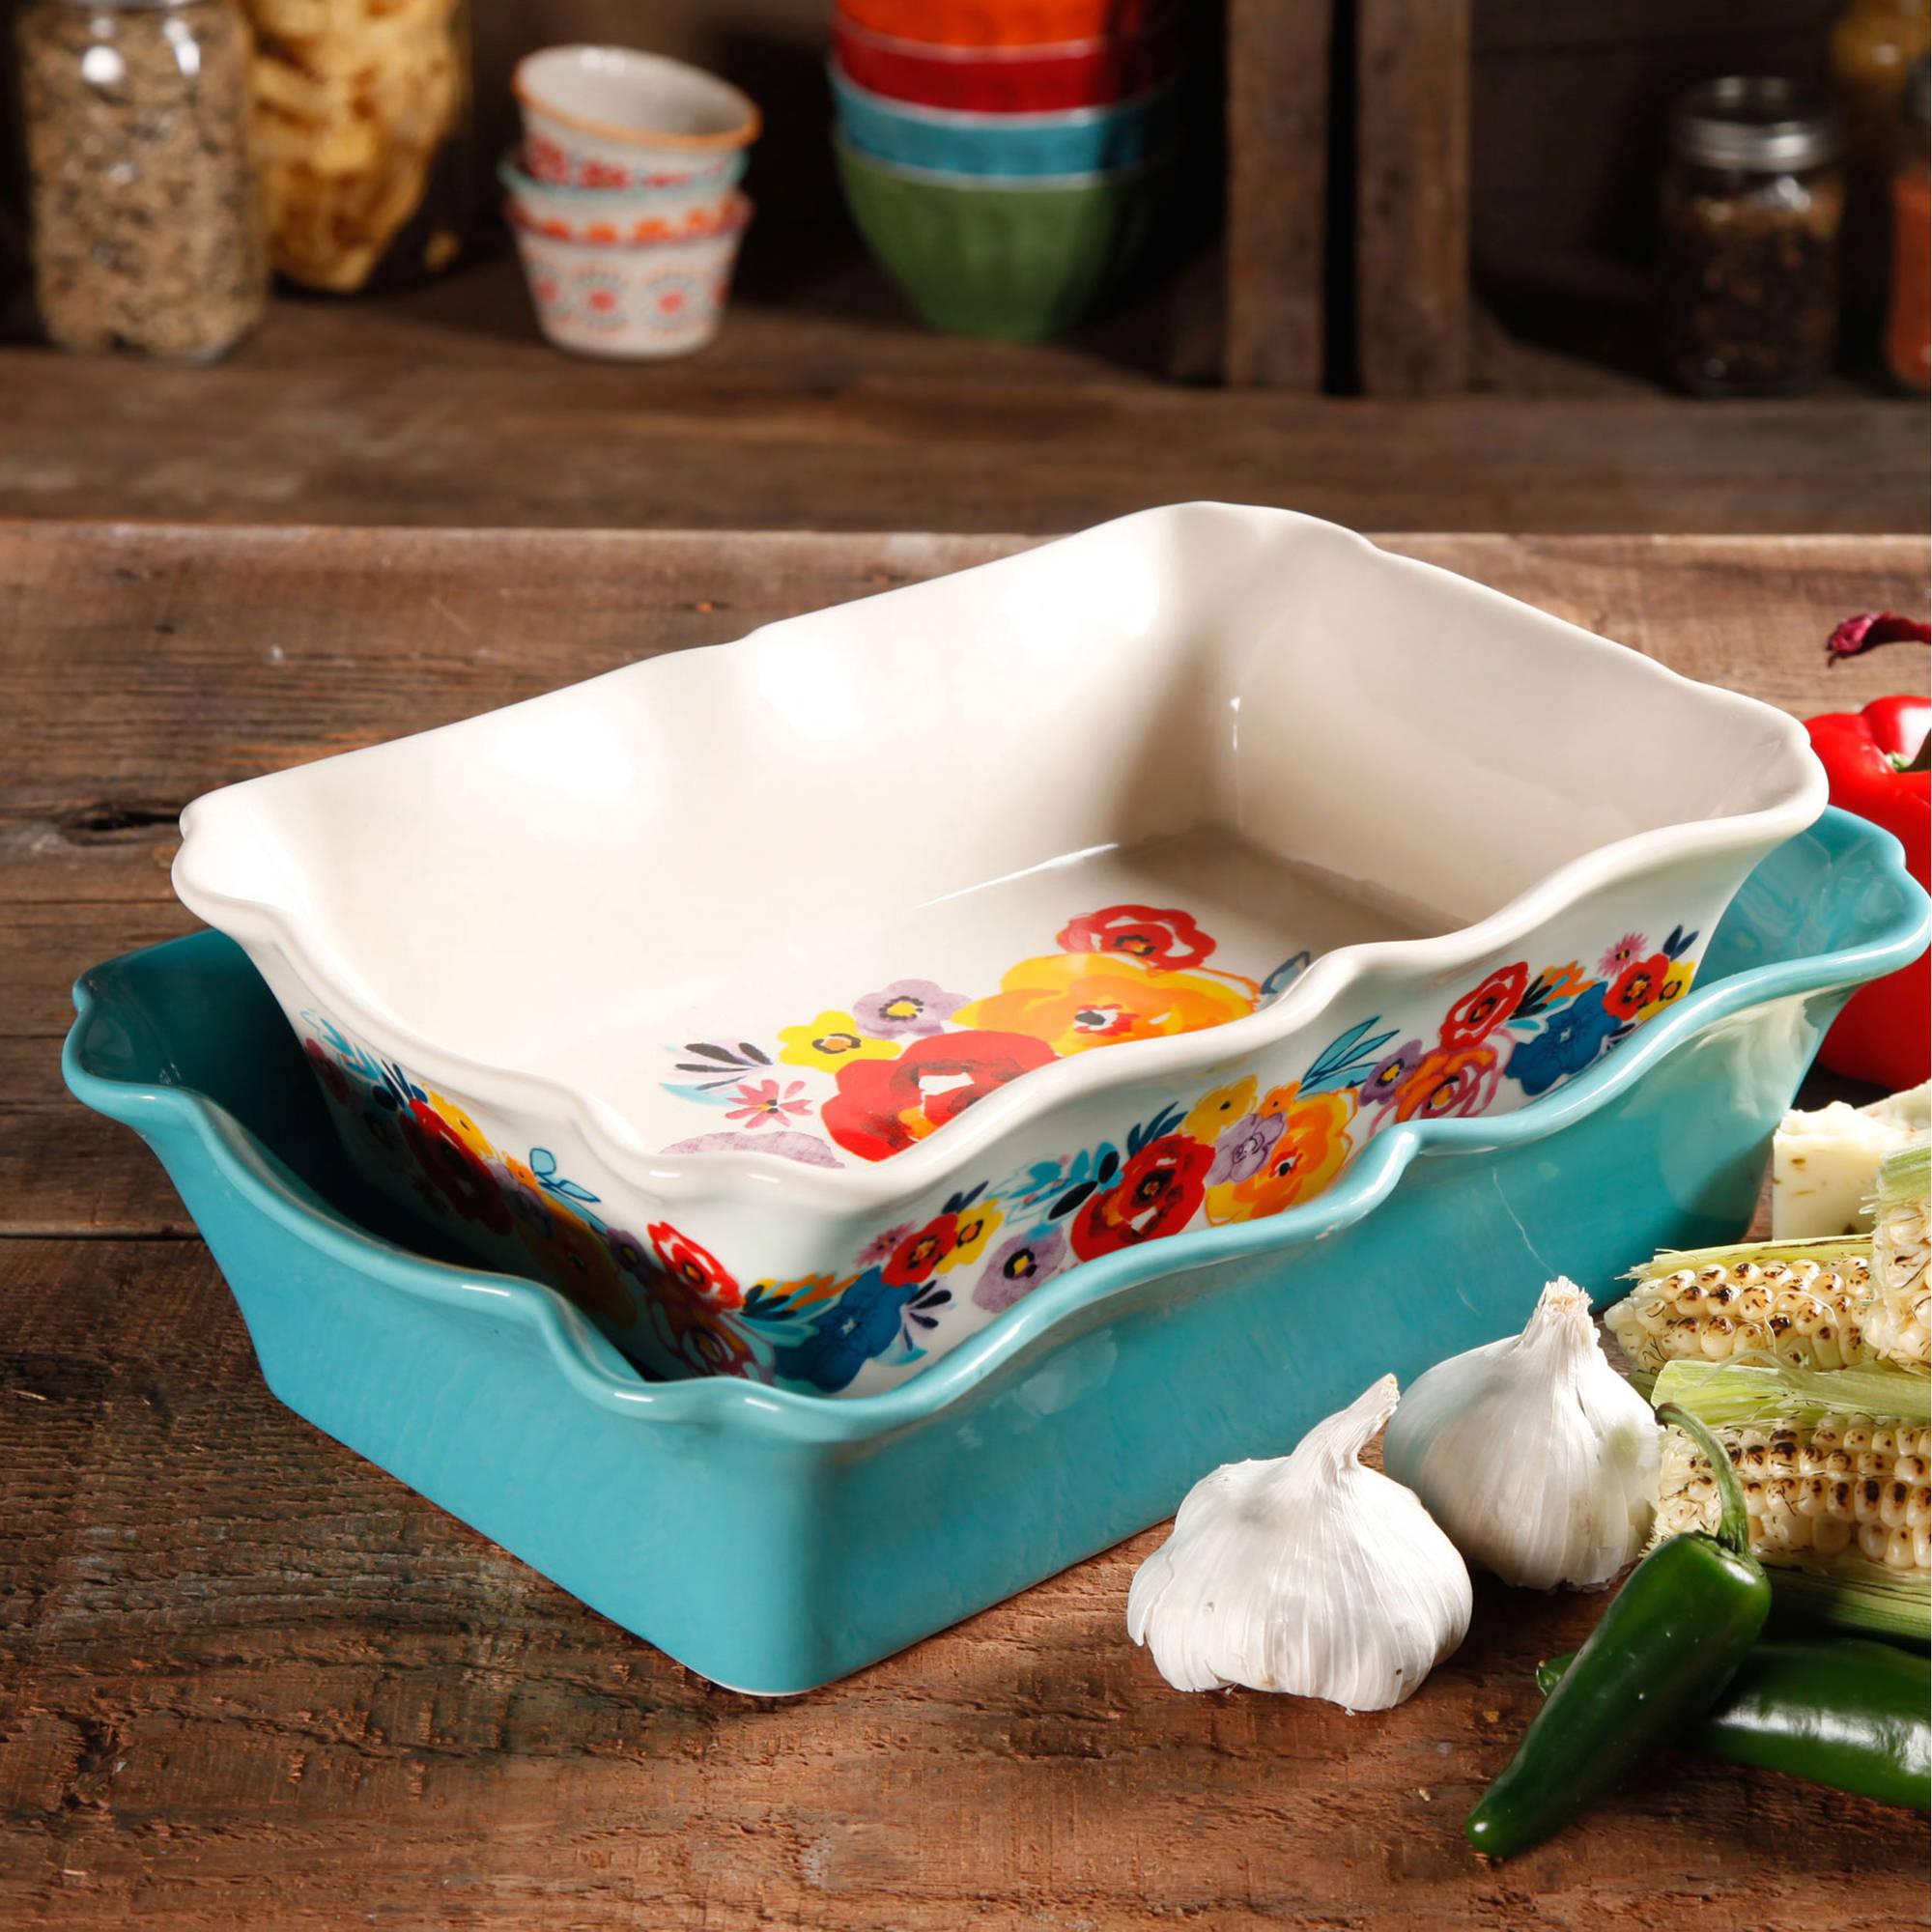 The Pioneer Woman Flea Market Rectangular Ruffle Top Ceramic Bakeware Set, 2.0 PIECE(S)